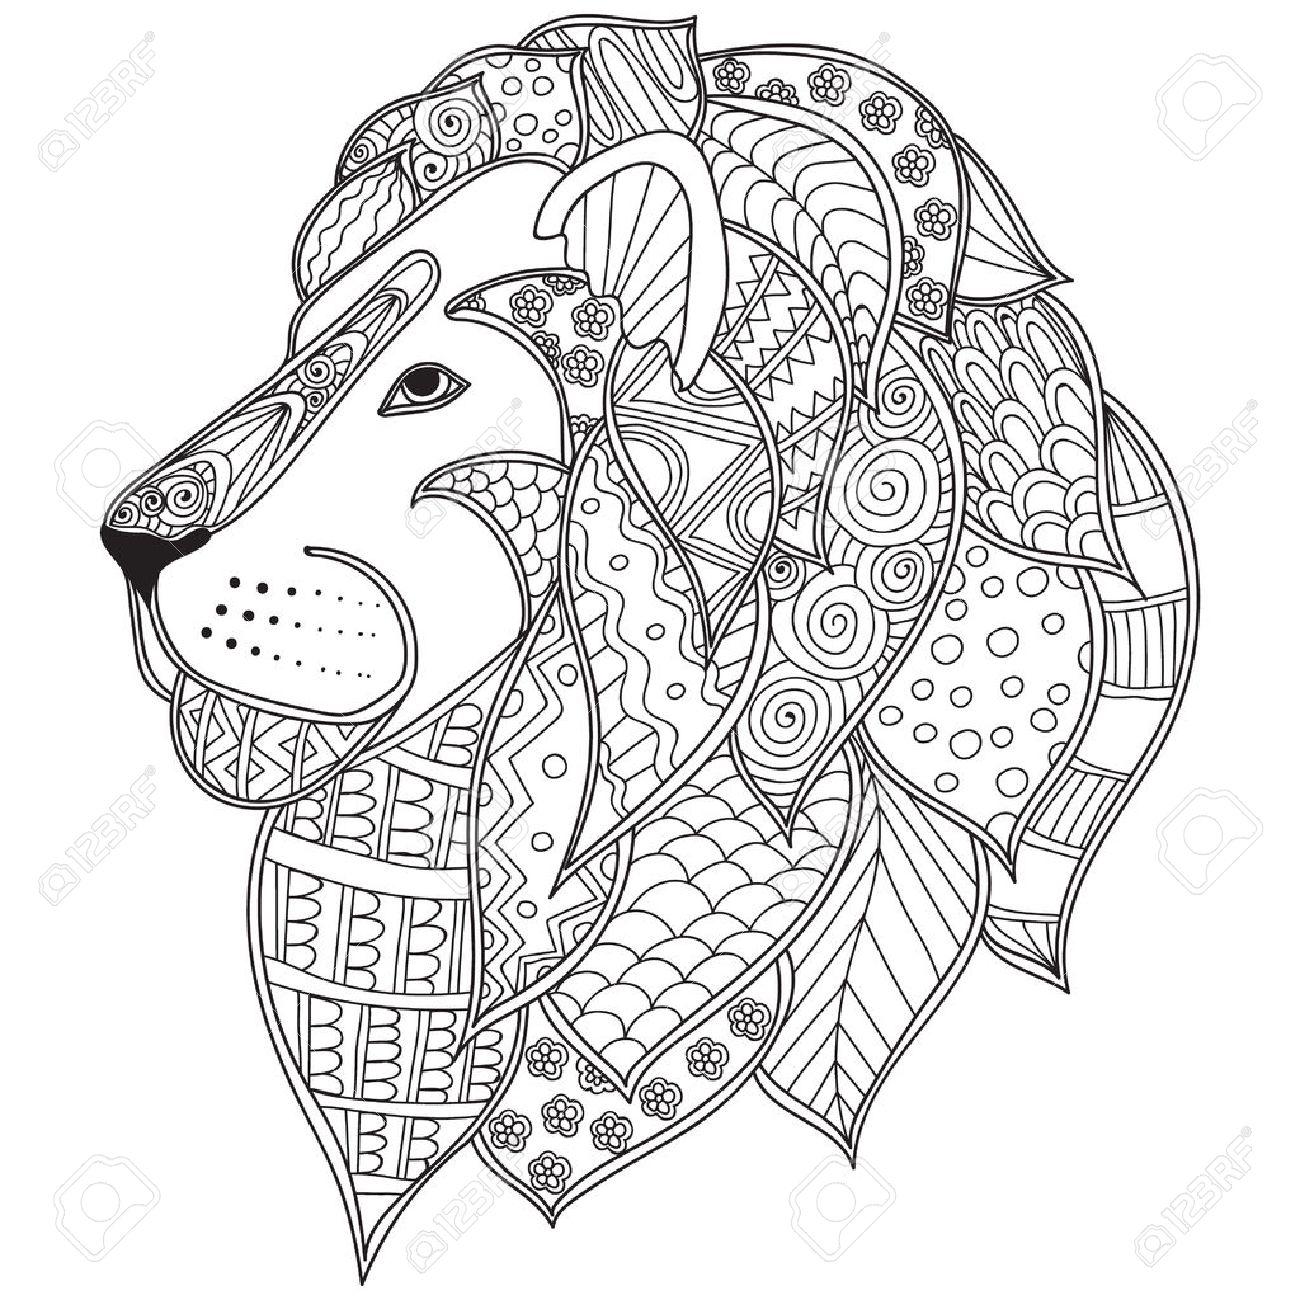 1300x1300 Hand Drawn Ornamental Outline Lion Head Illustration Decorated